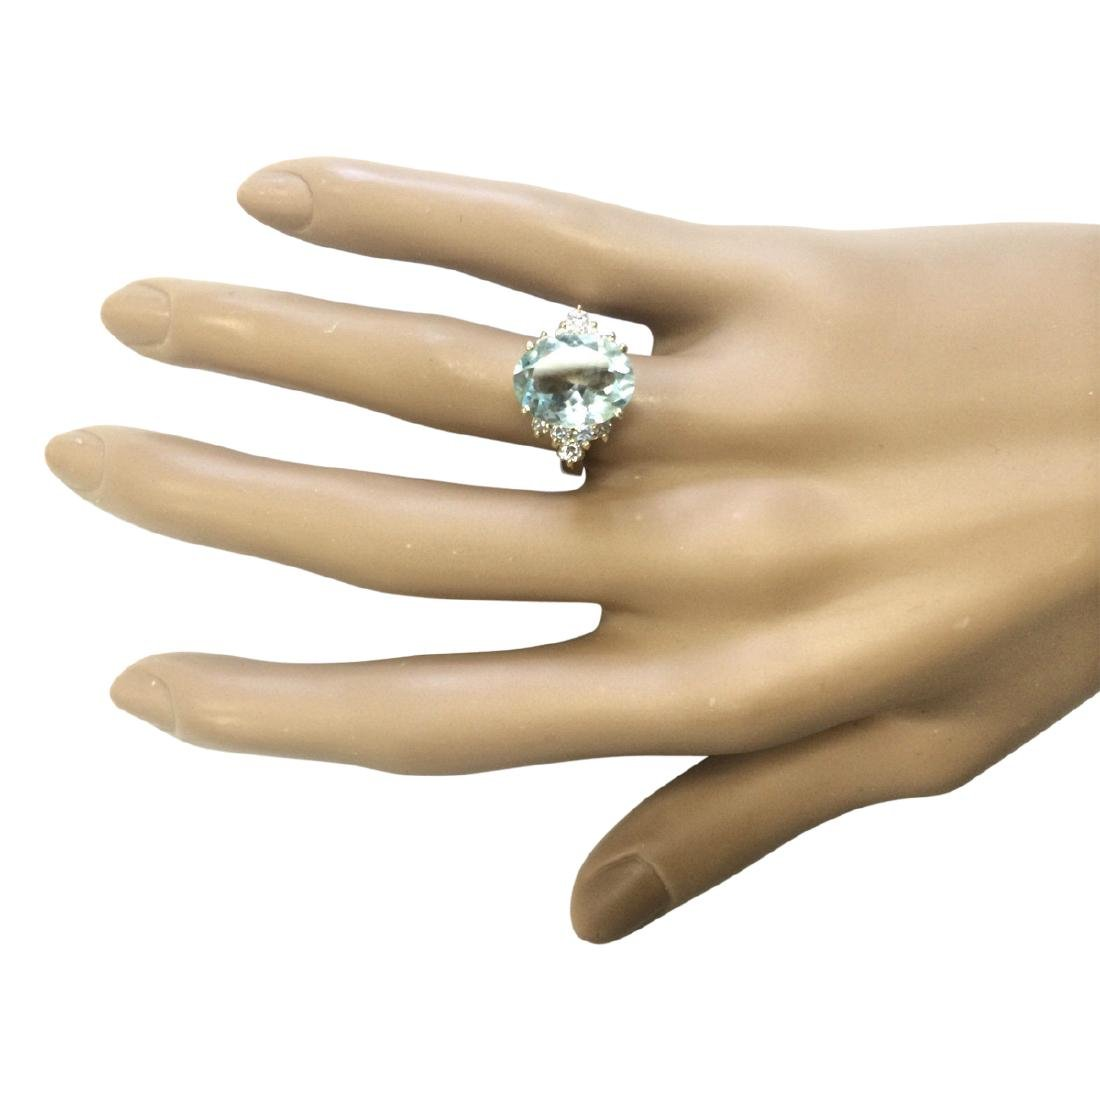 4.75 CTW Natural Aquamarine And Diamond Ring In 18K - 4